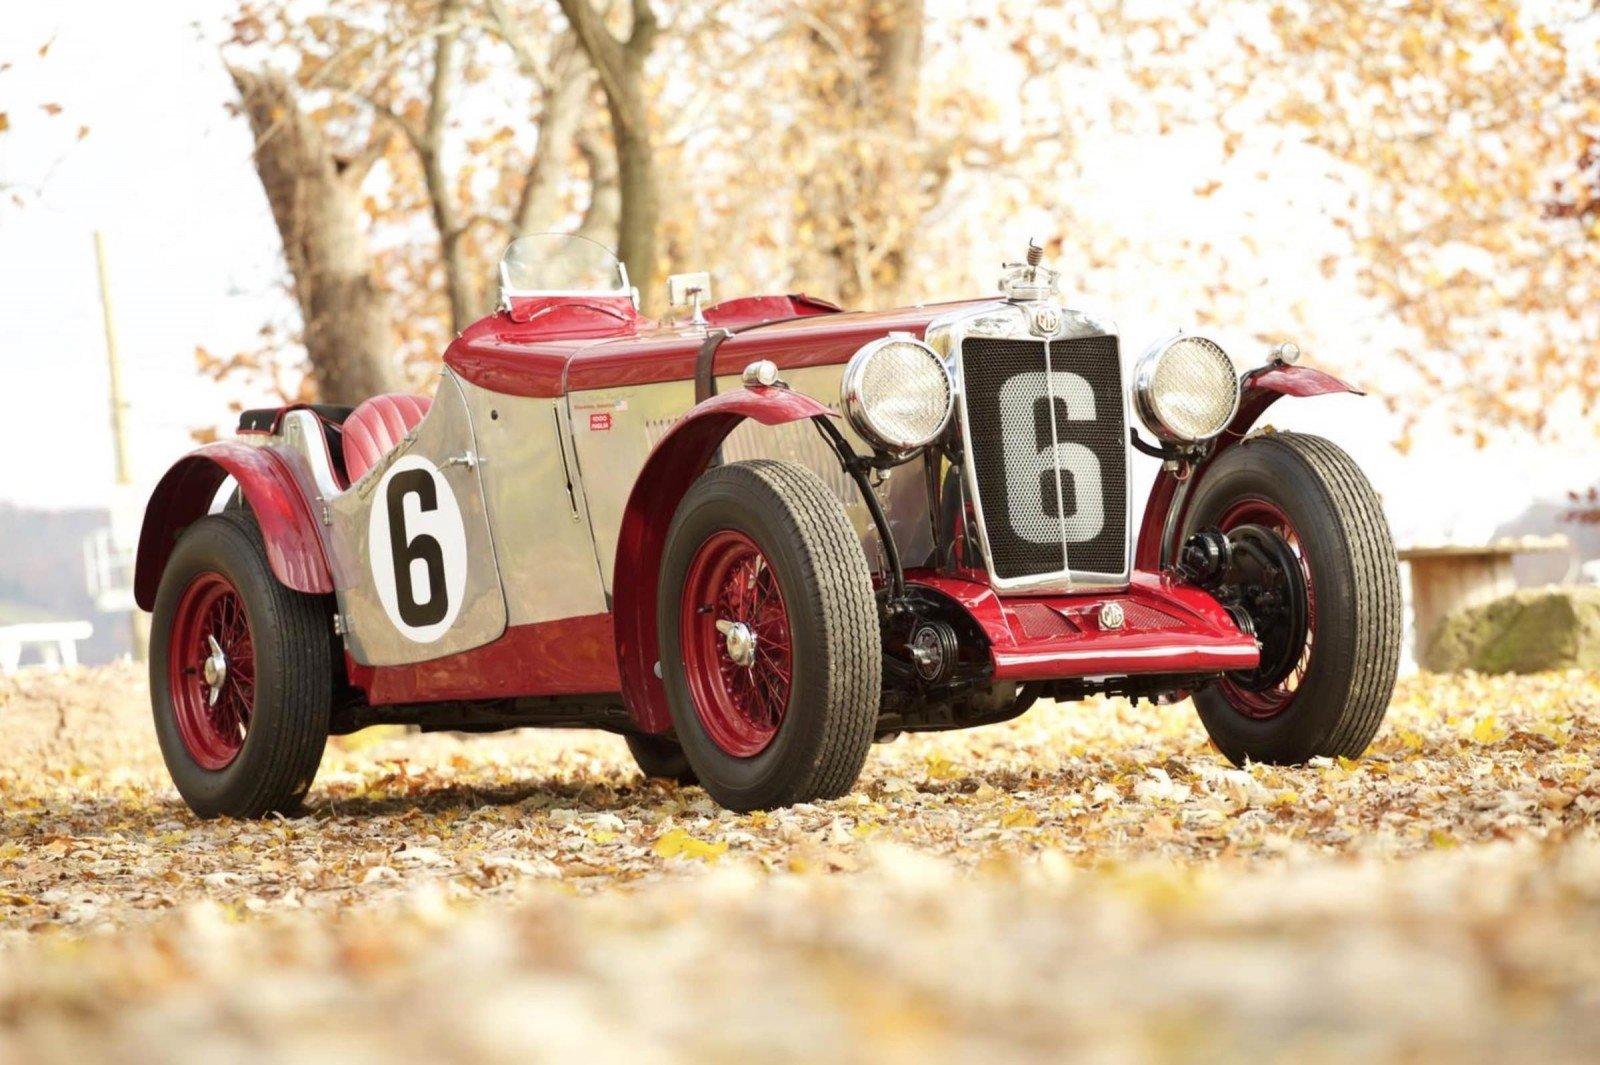 MG Cars Documentary